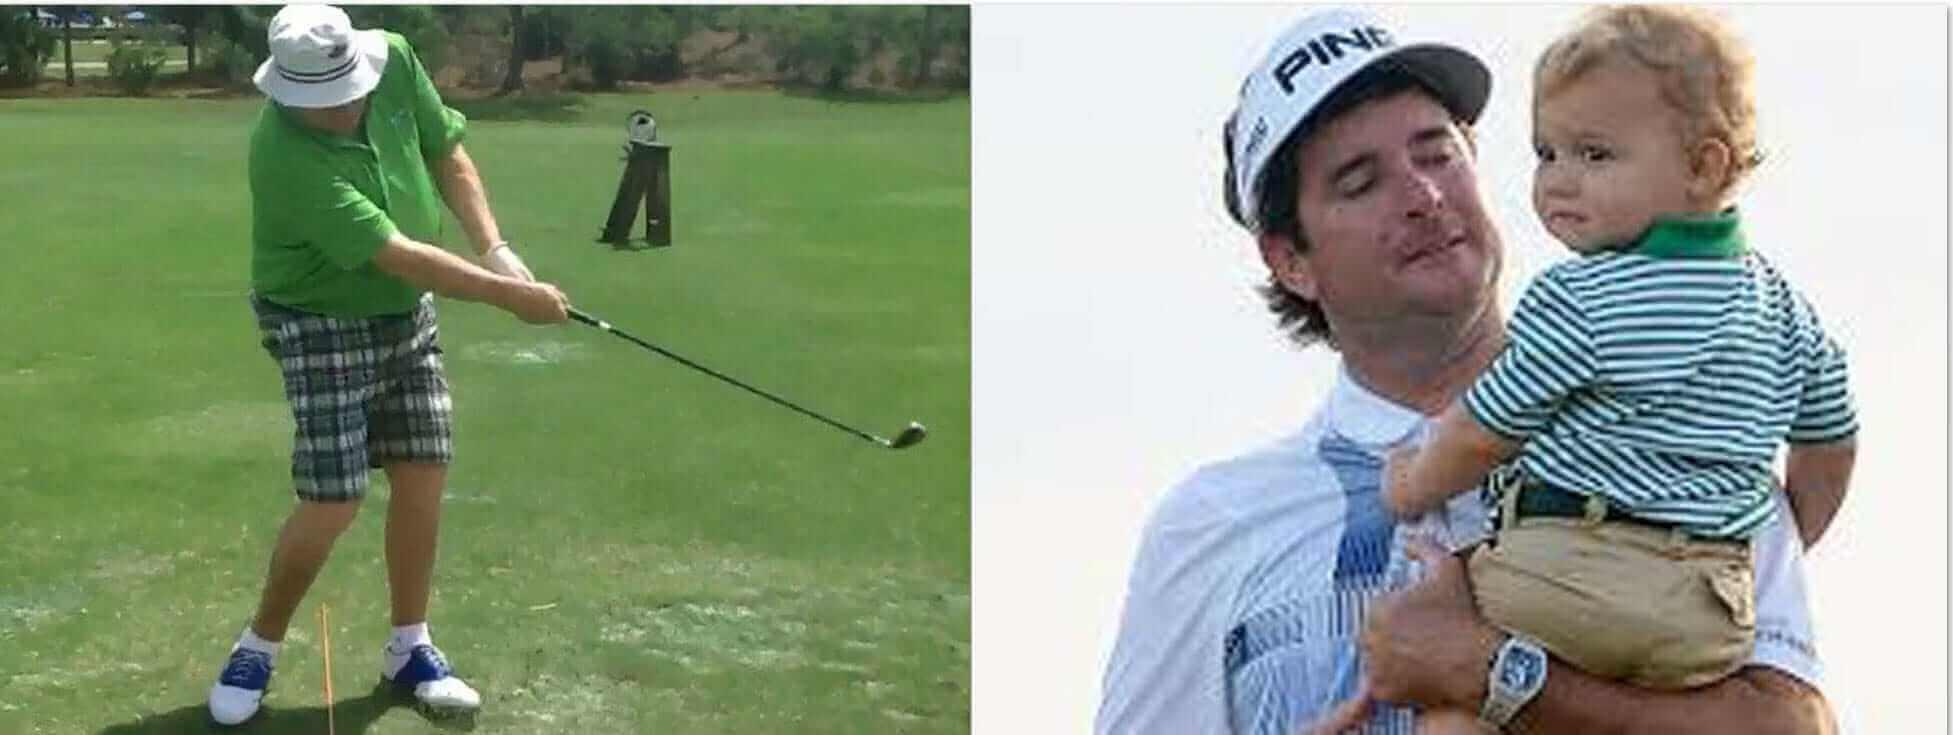 Bubba Watson, John Hughes Golf, Orlando Golf Lessons, Best Orlando Golf Schools, Best Orlando Junior Golf Lessons, Best Orlando Junior Golf Schools, Best Orlando Ladies Golf Lessons